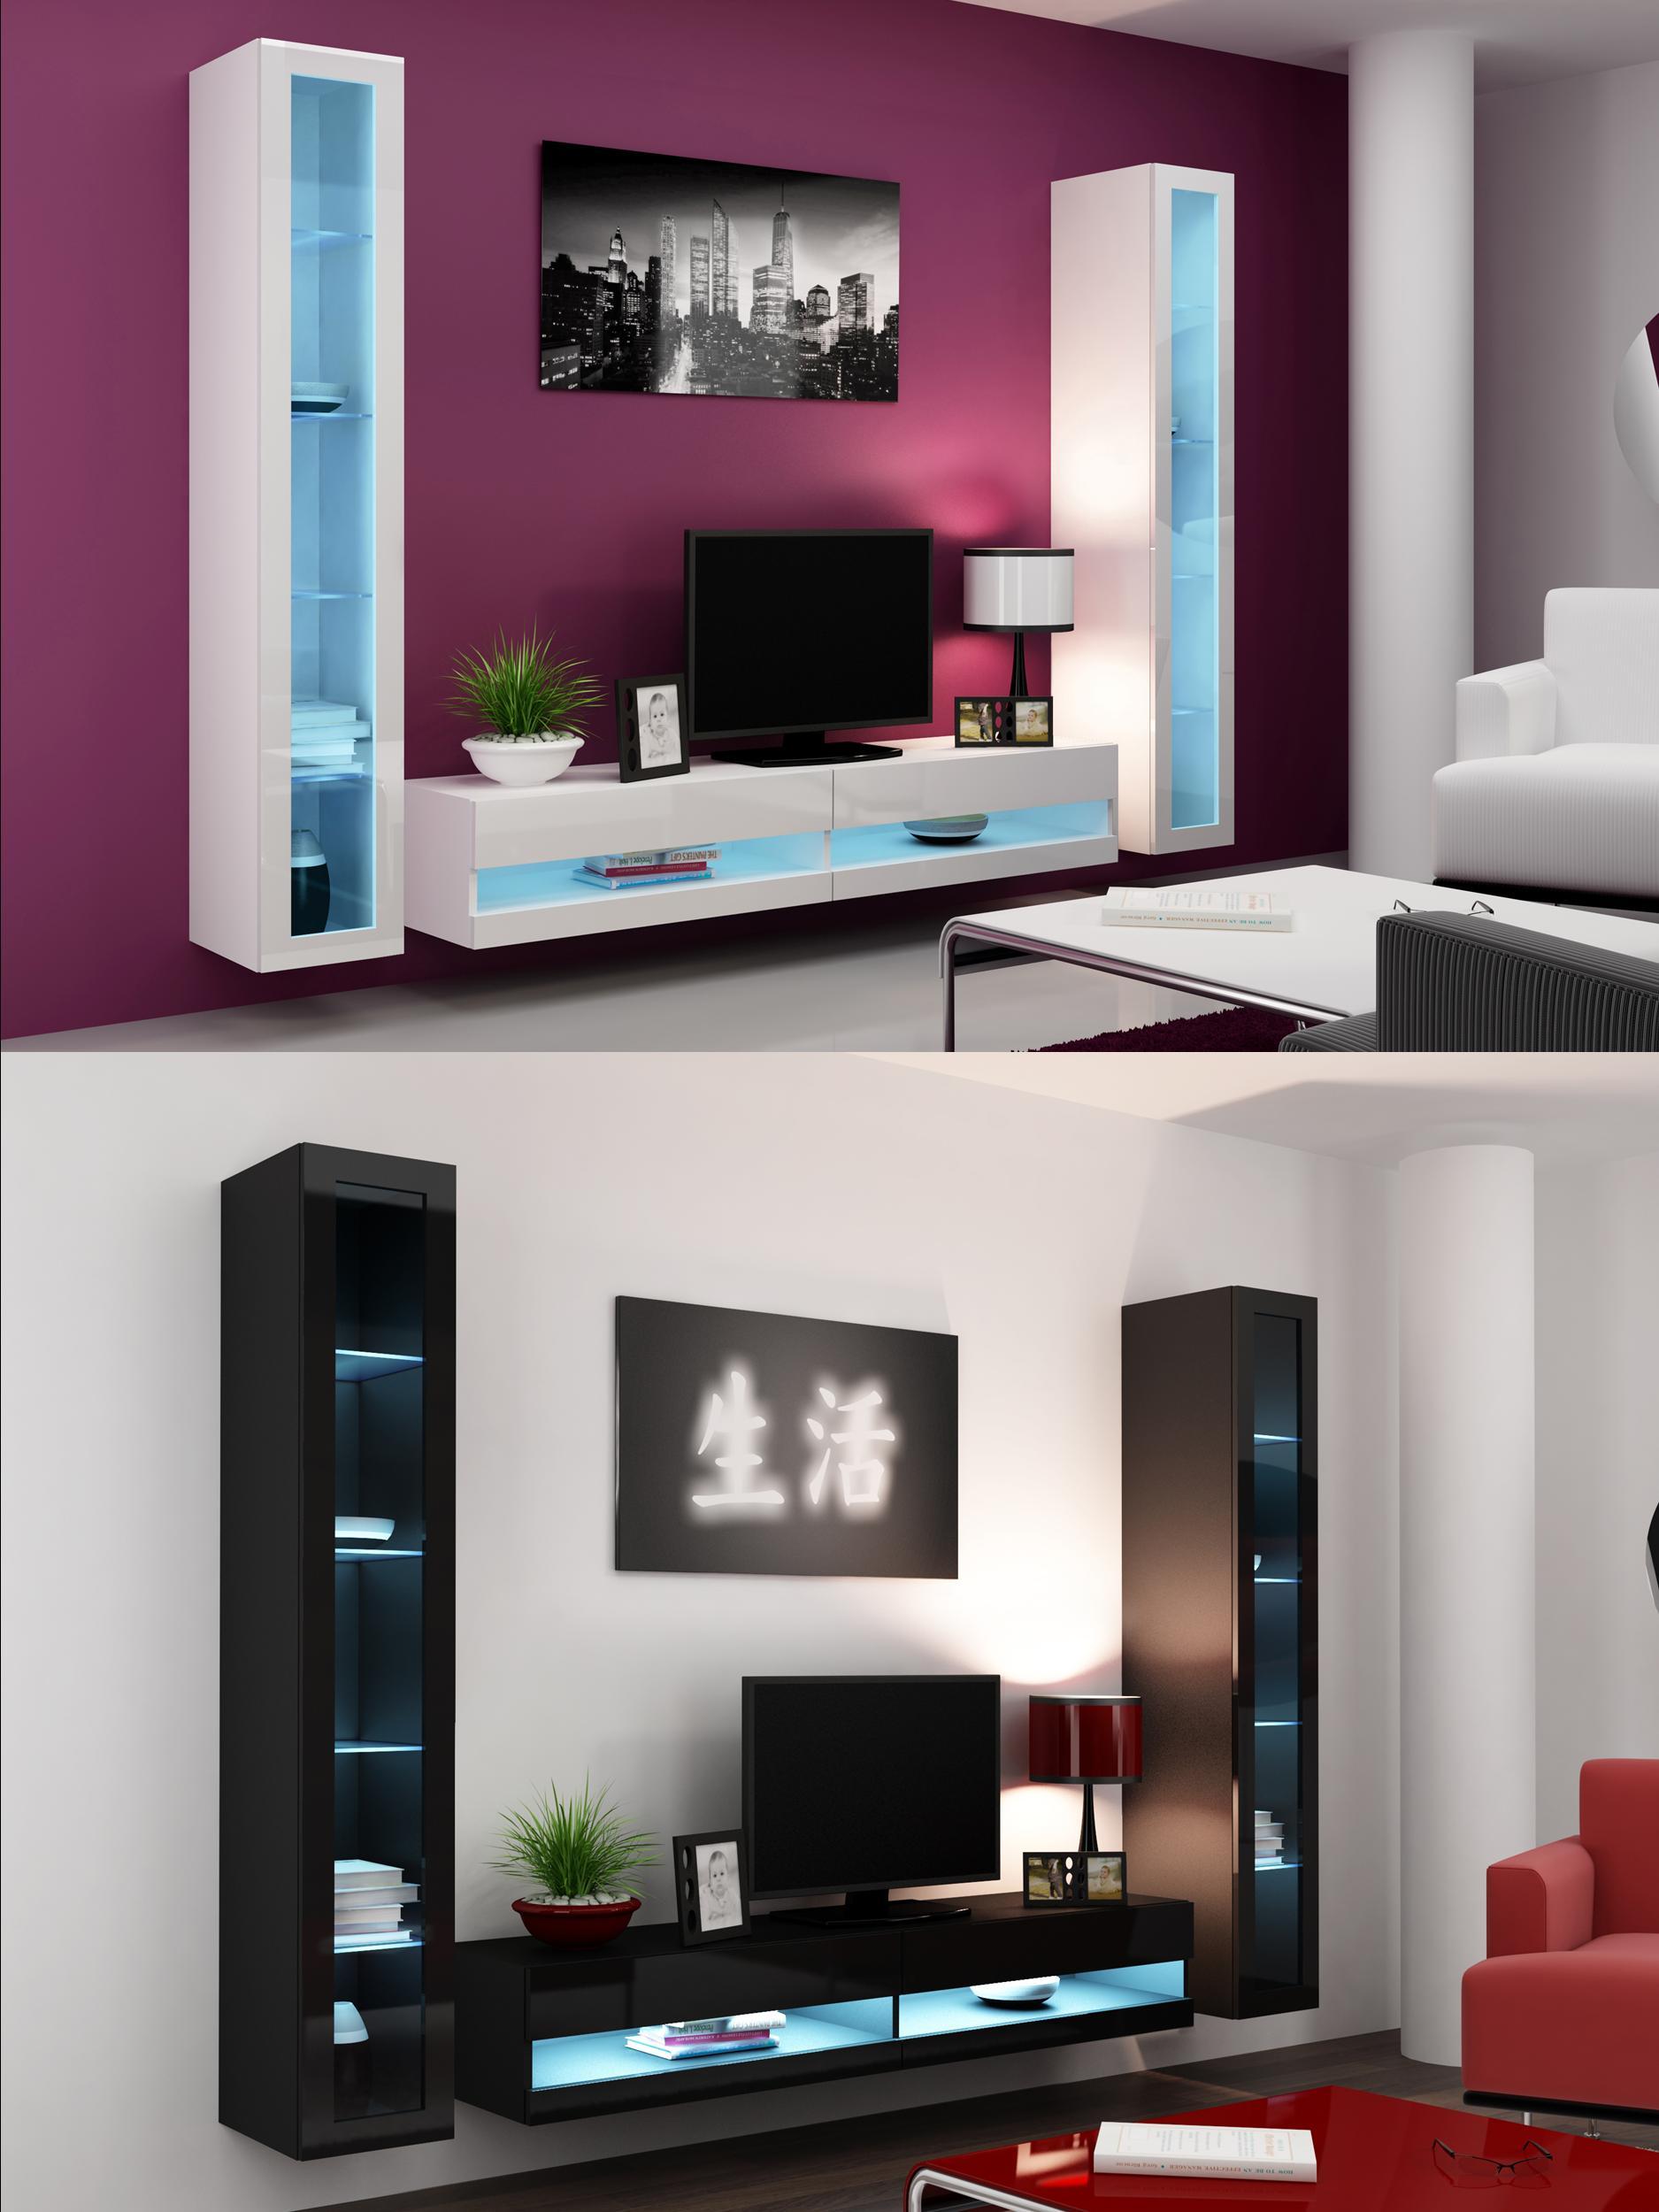 High Gloss Living Room Set with LED Lights, TV Stand, Wall